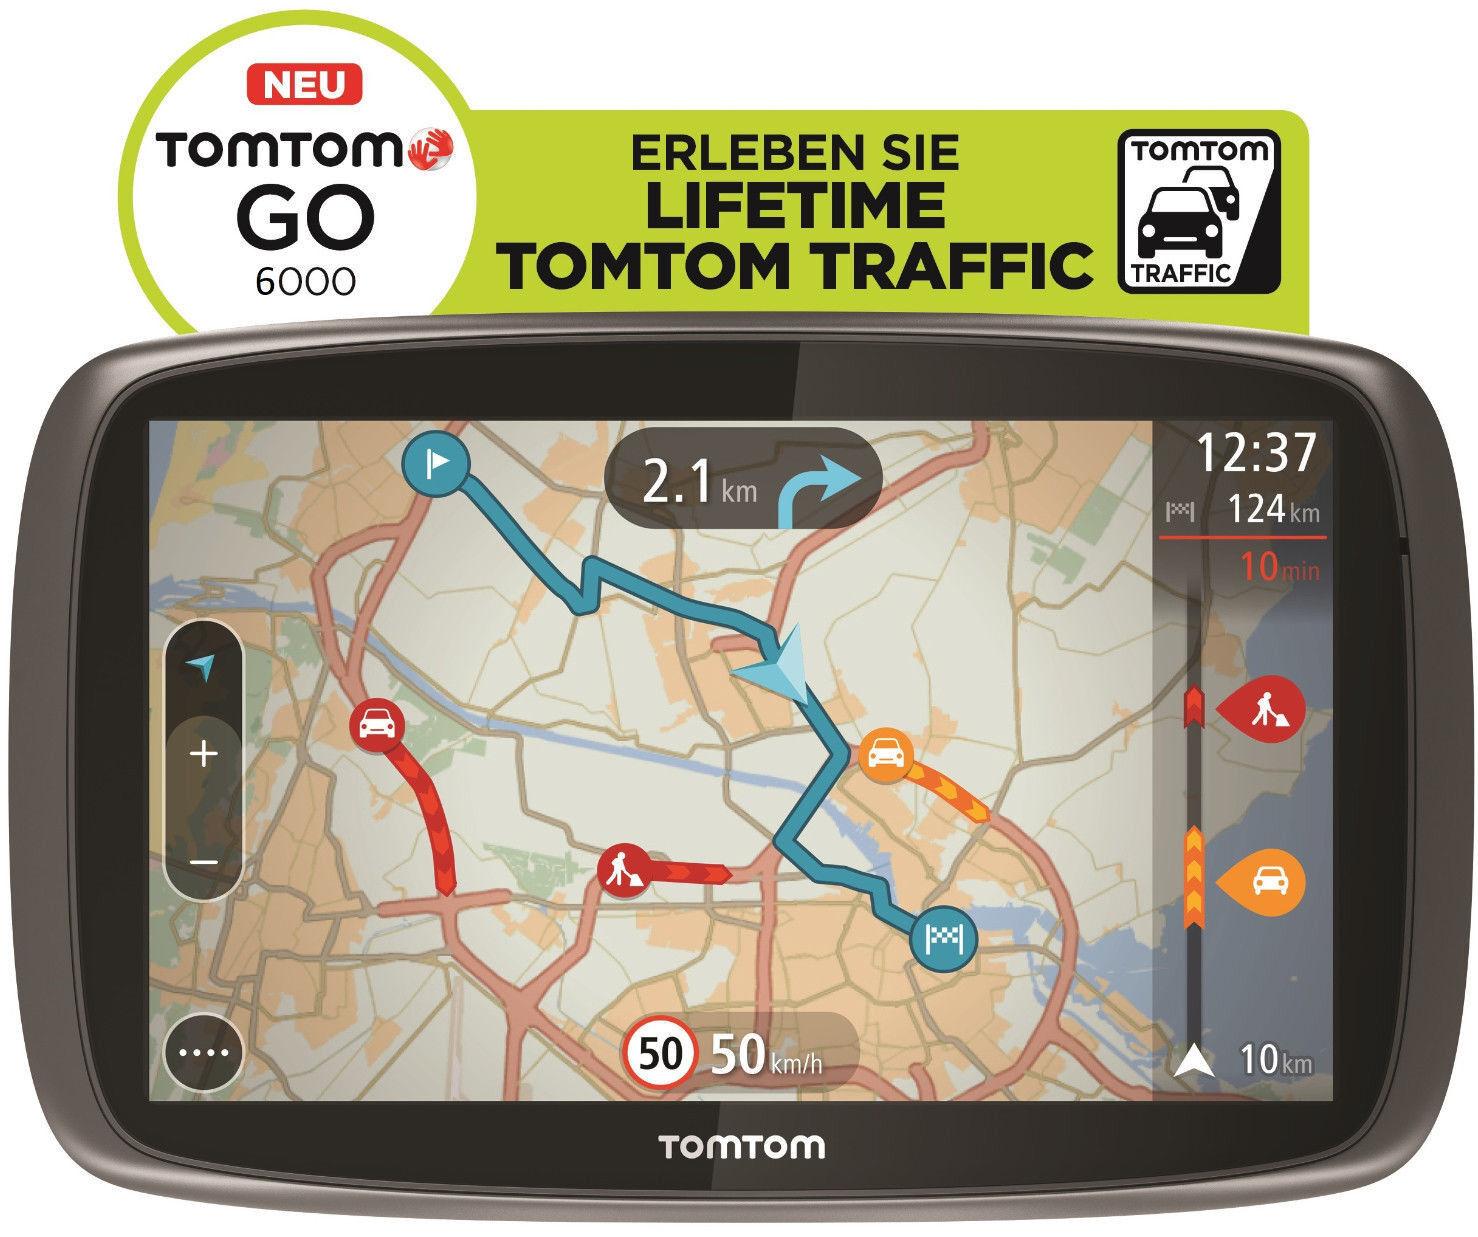 Netzteil Netzlader Navigation Ladeger/ät Ladekabel f/ür TomTom Go 6100